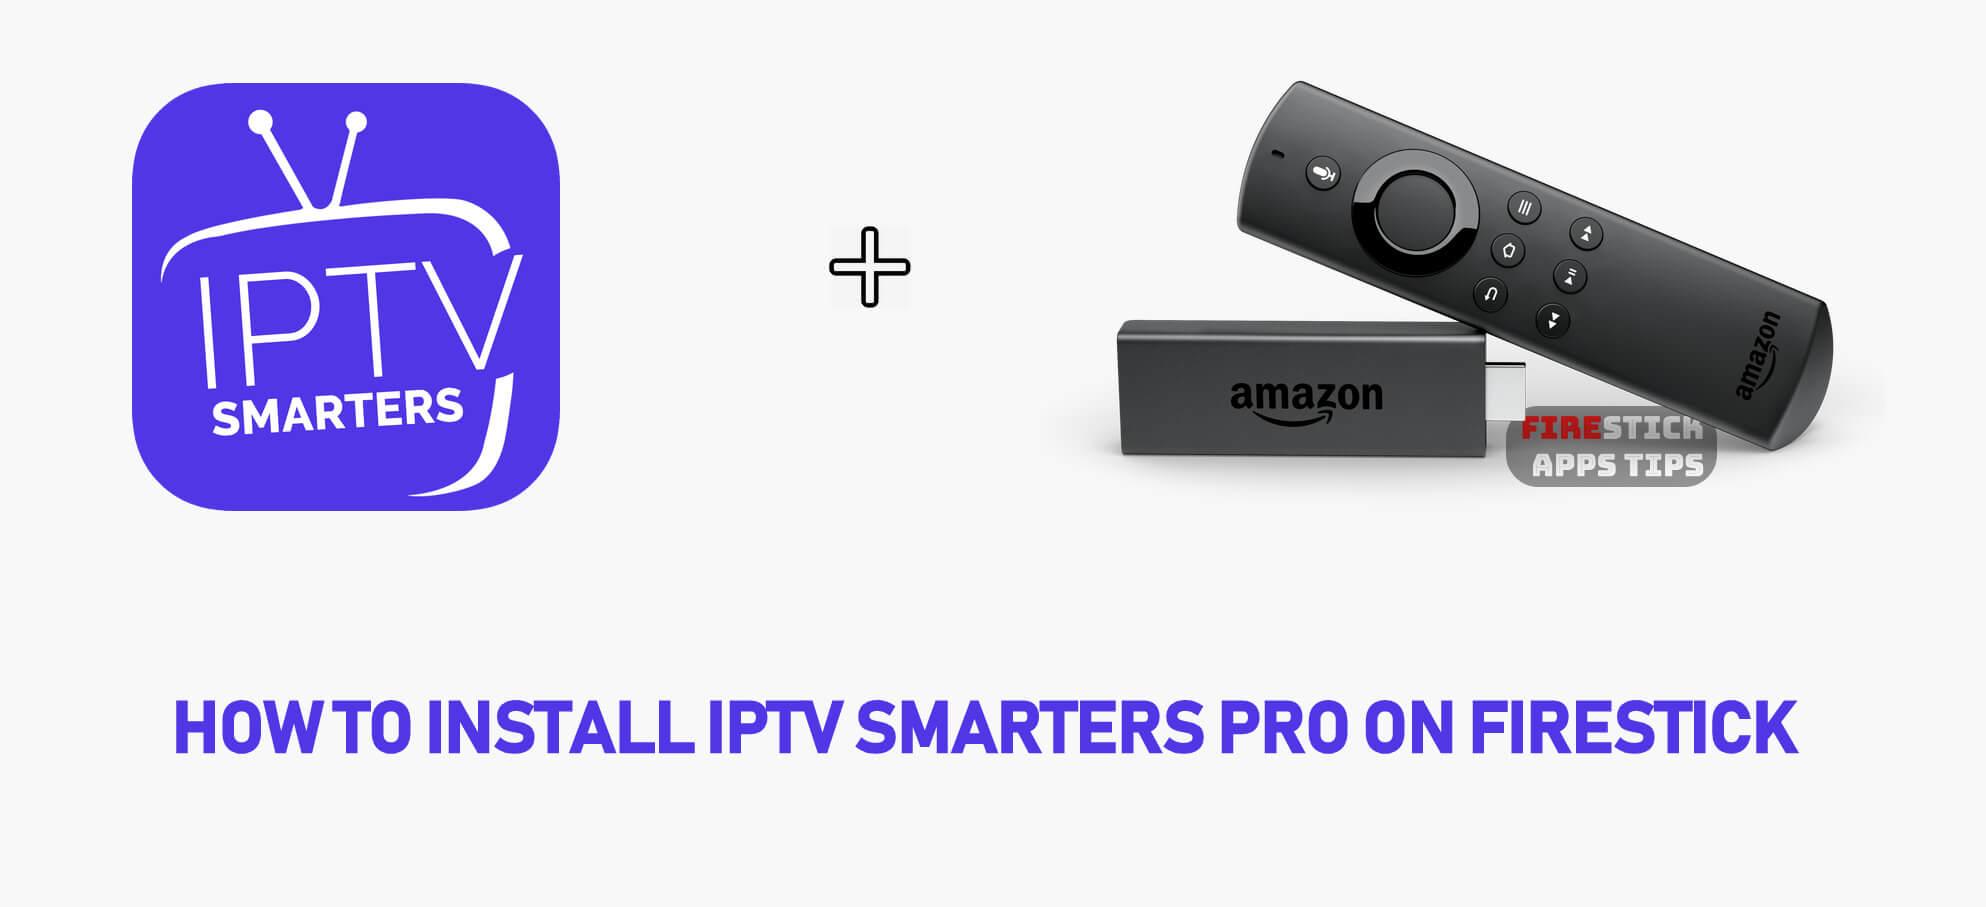 Cómo instalar IPTV Smarters Pro en Firestick [2020]